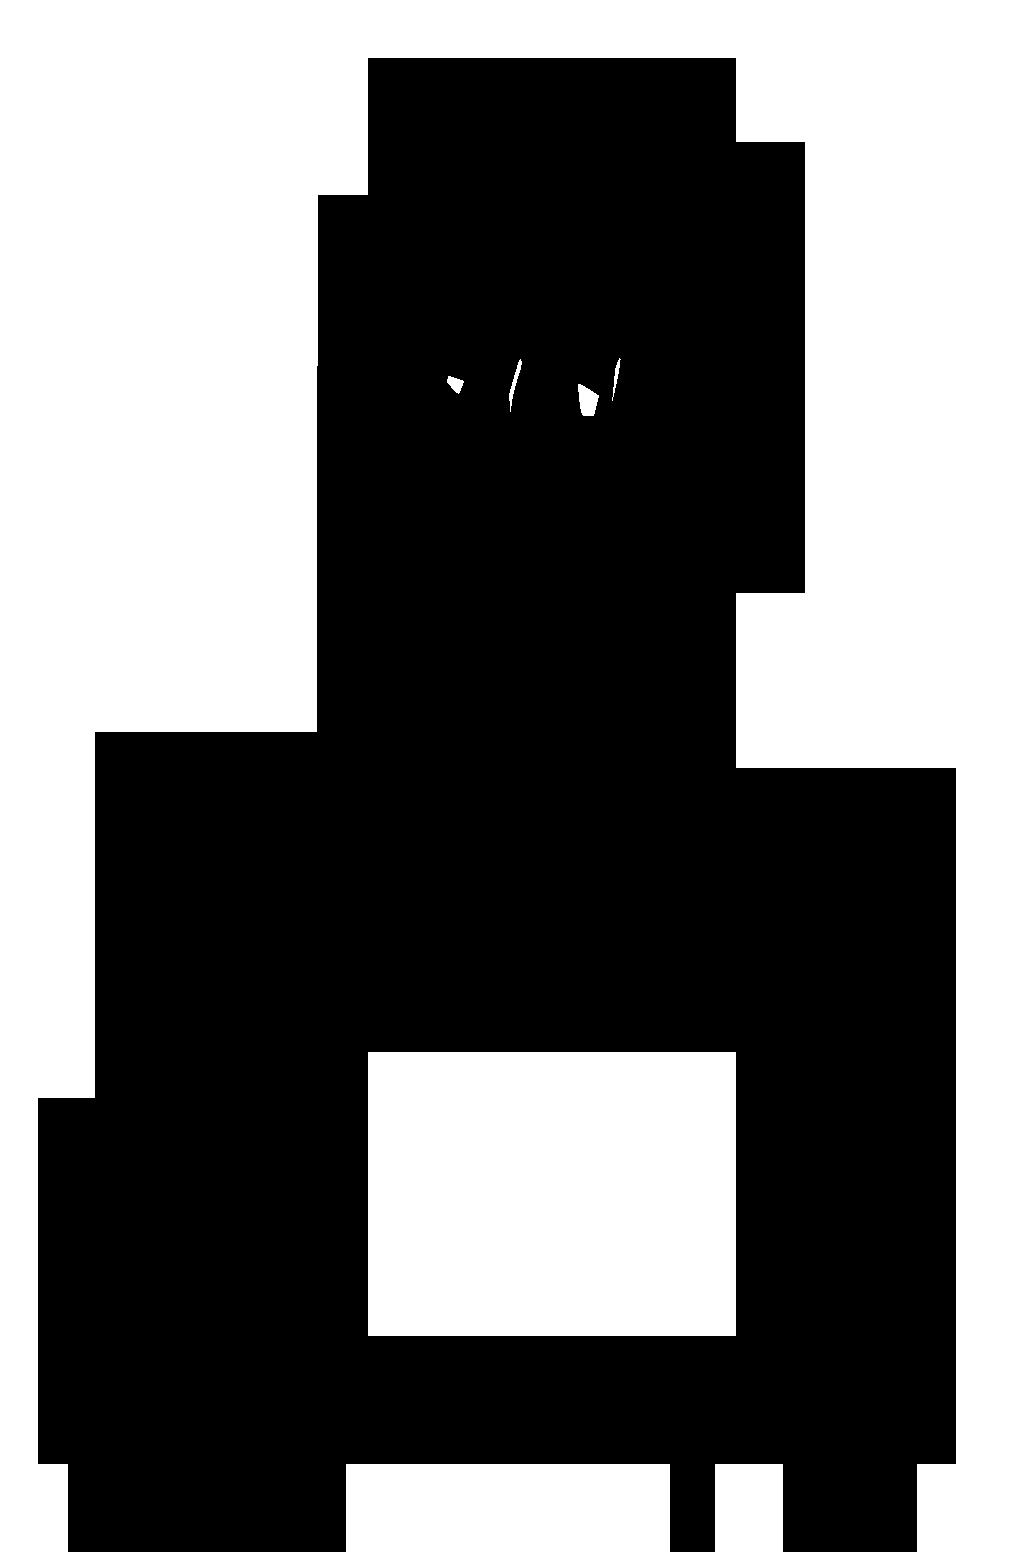 X Ray Line Drawing : Hibari lines by ray on deviantart